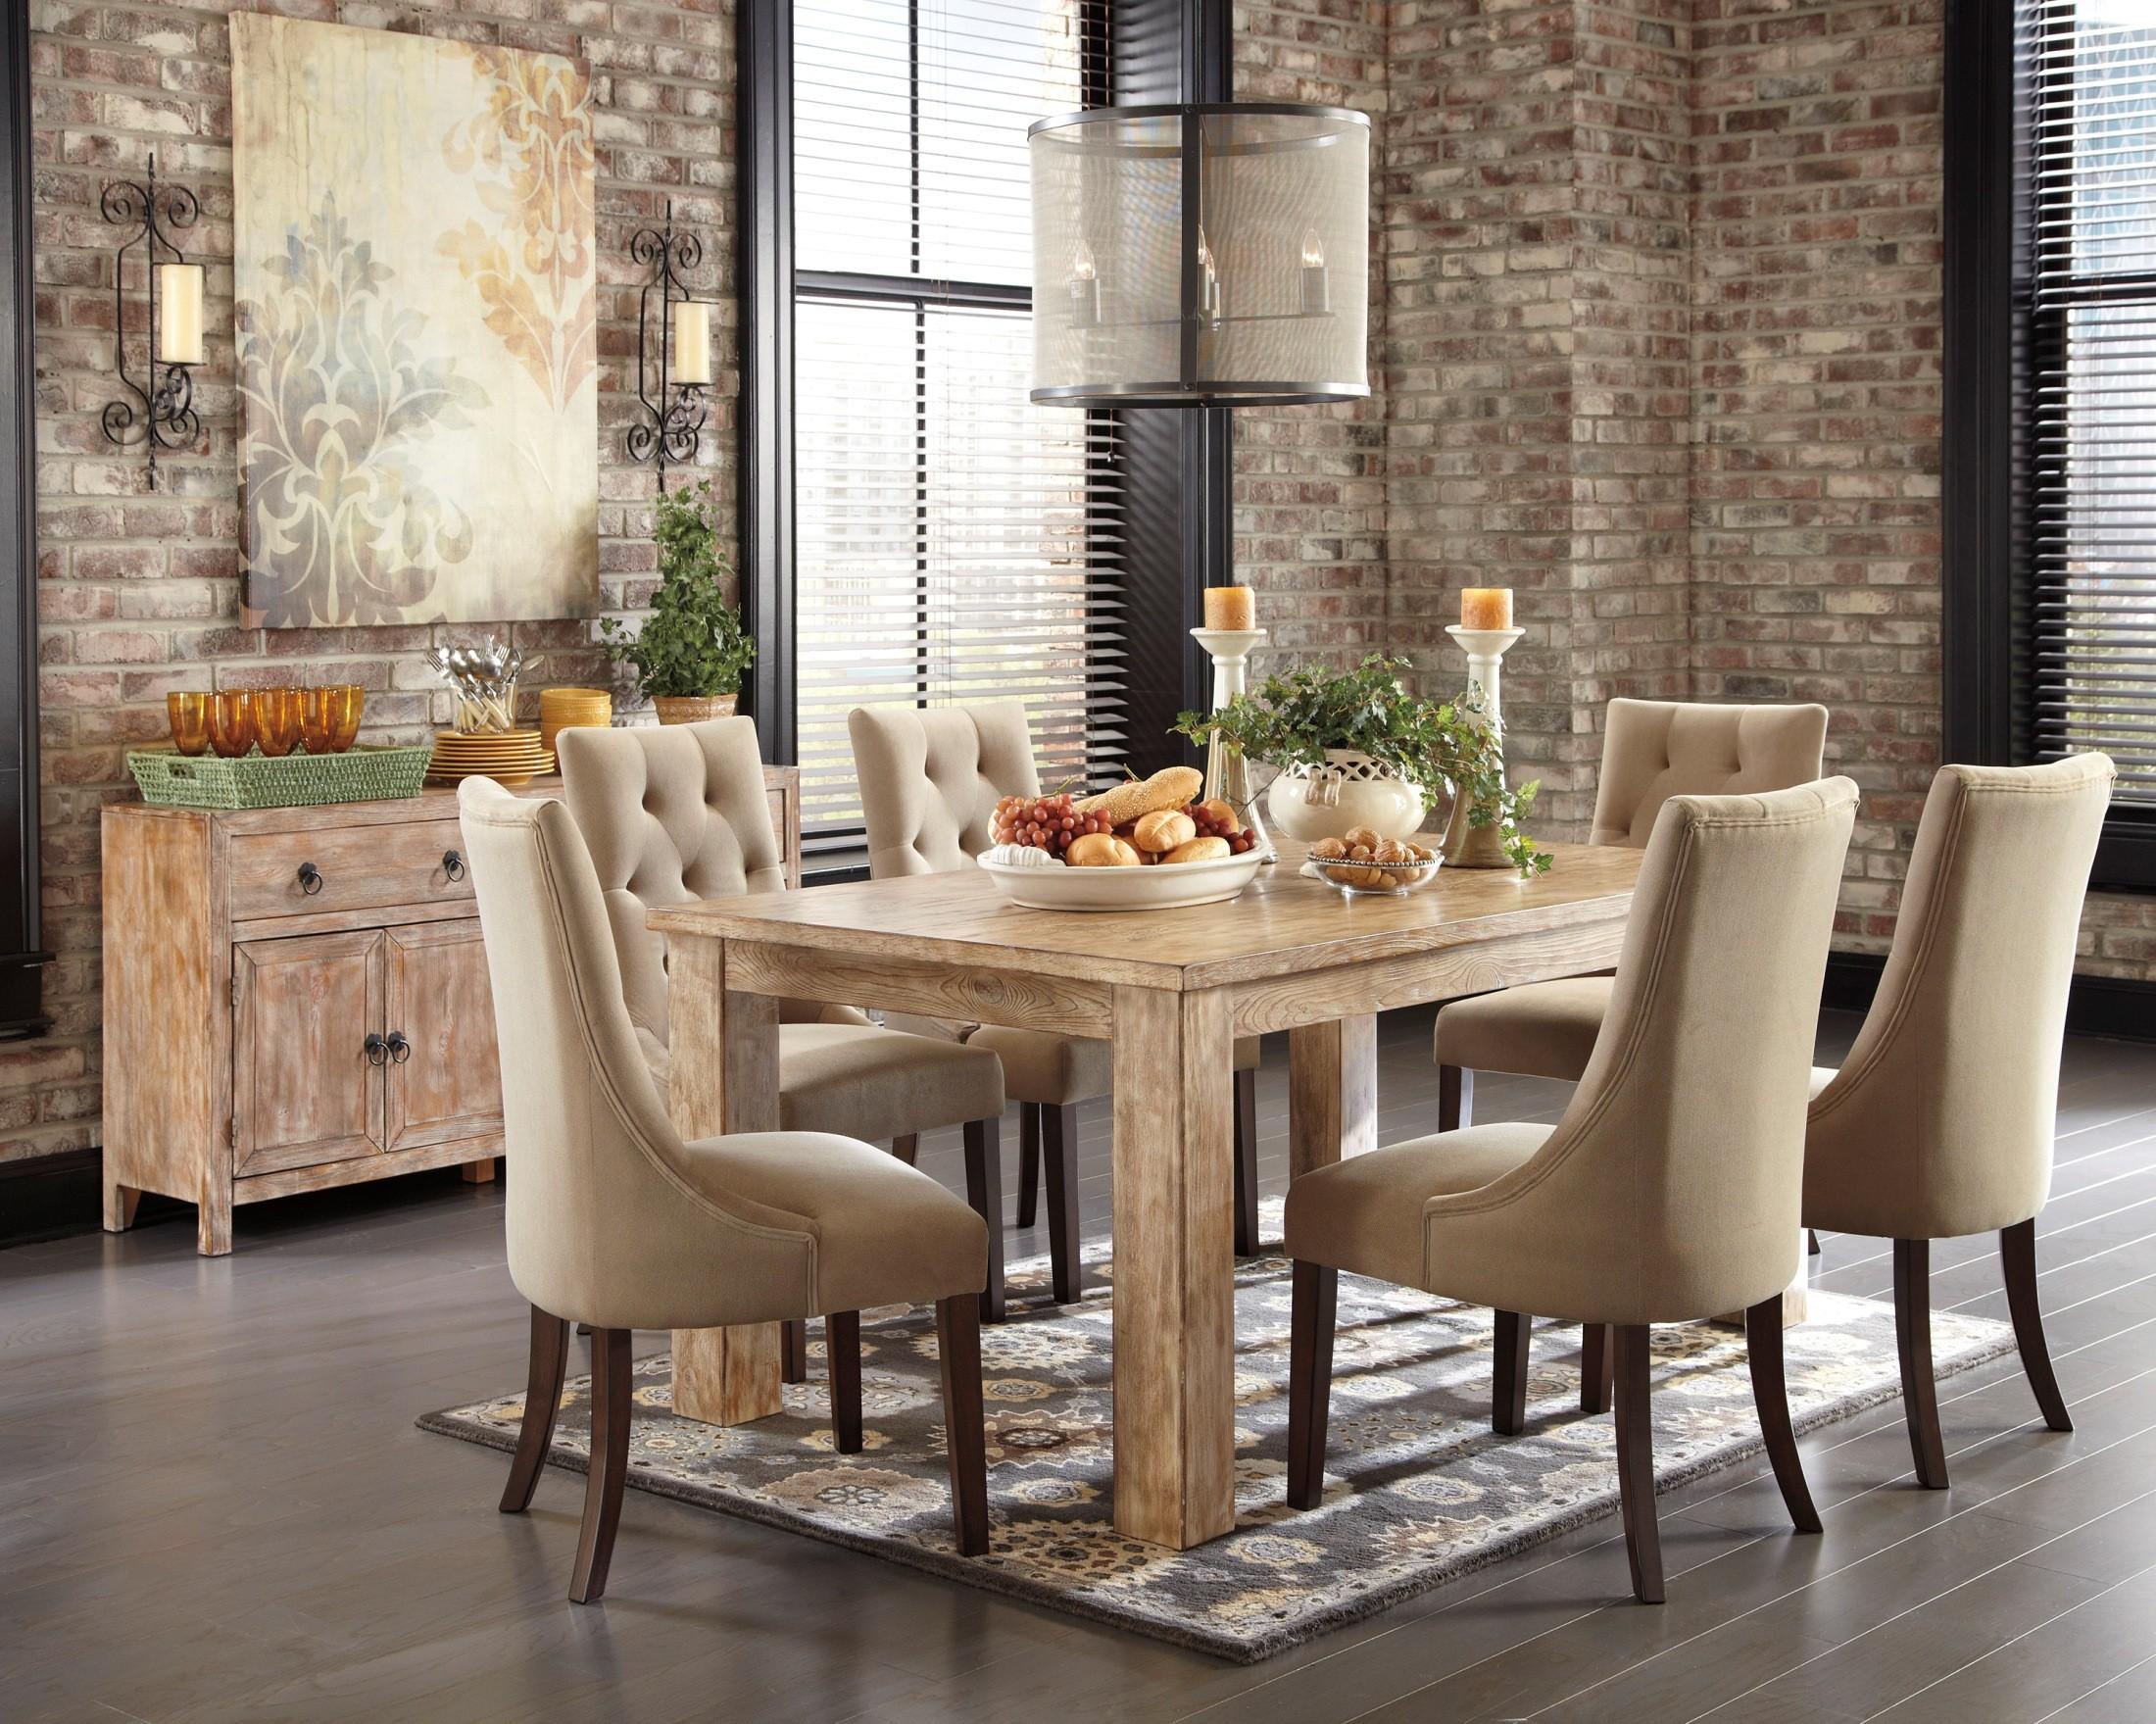 Mestler Driftwood Dining Room Set From Ashley D540 225